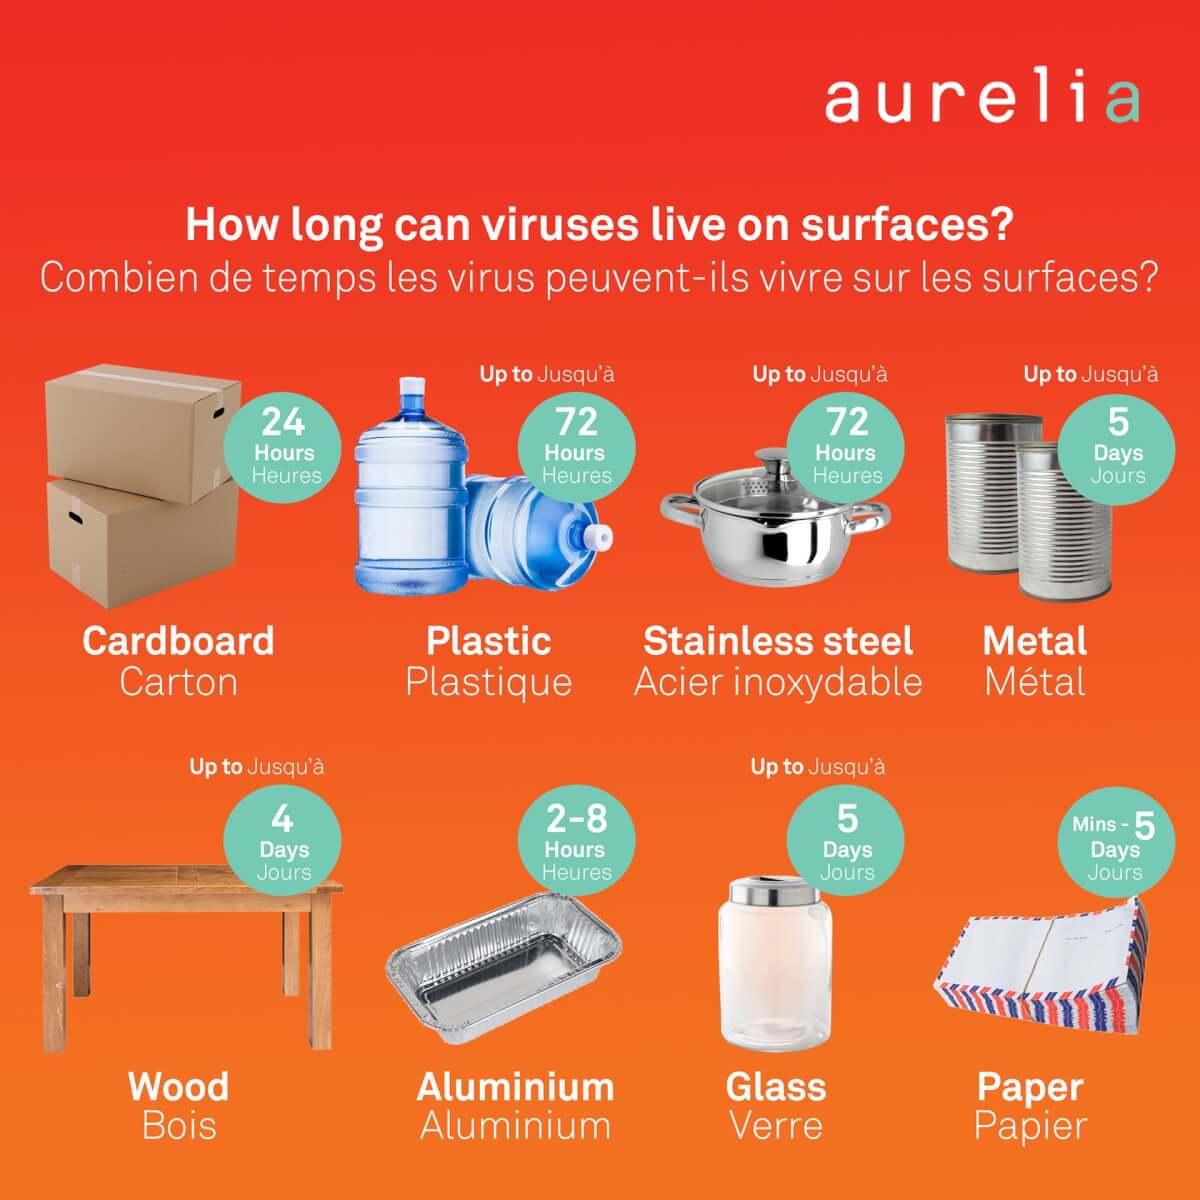 Aurelia Gloves Canada Blog Viruses on surfaces